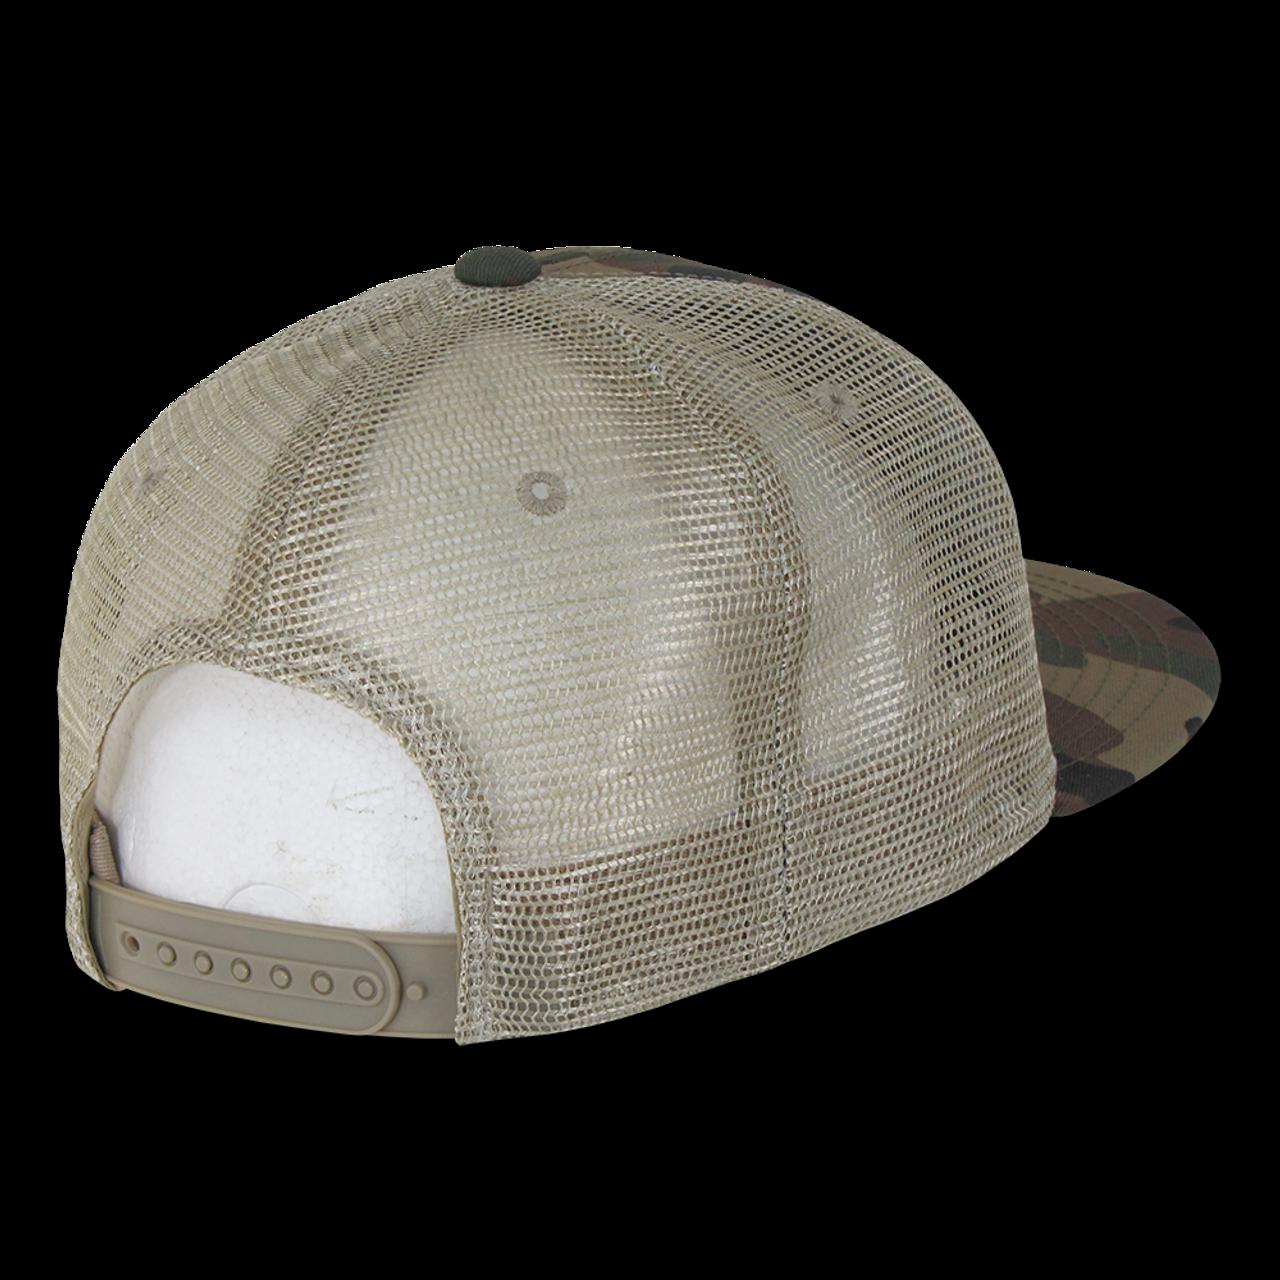 9757c42a0f794 ... Cotton Flat Bill Trucker Cap - Woodland Camouflage/Woodland Camouflage/Khaki  ...